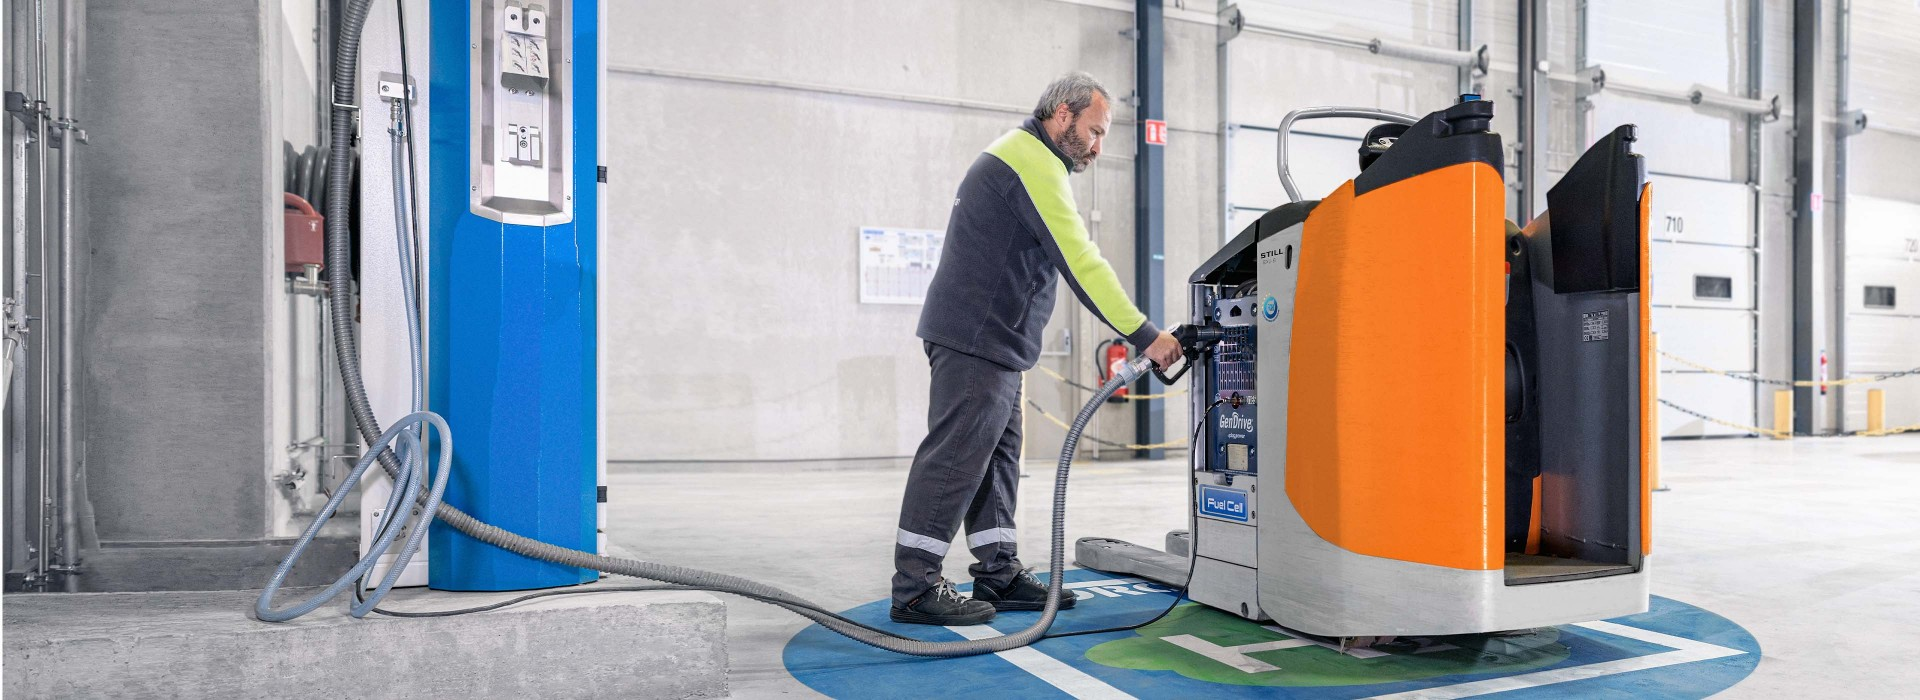 Brennstoffzellen-Technik